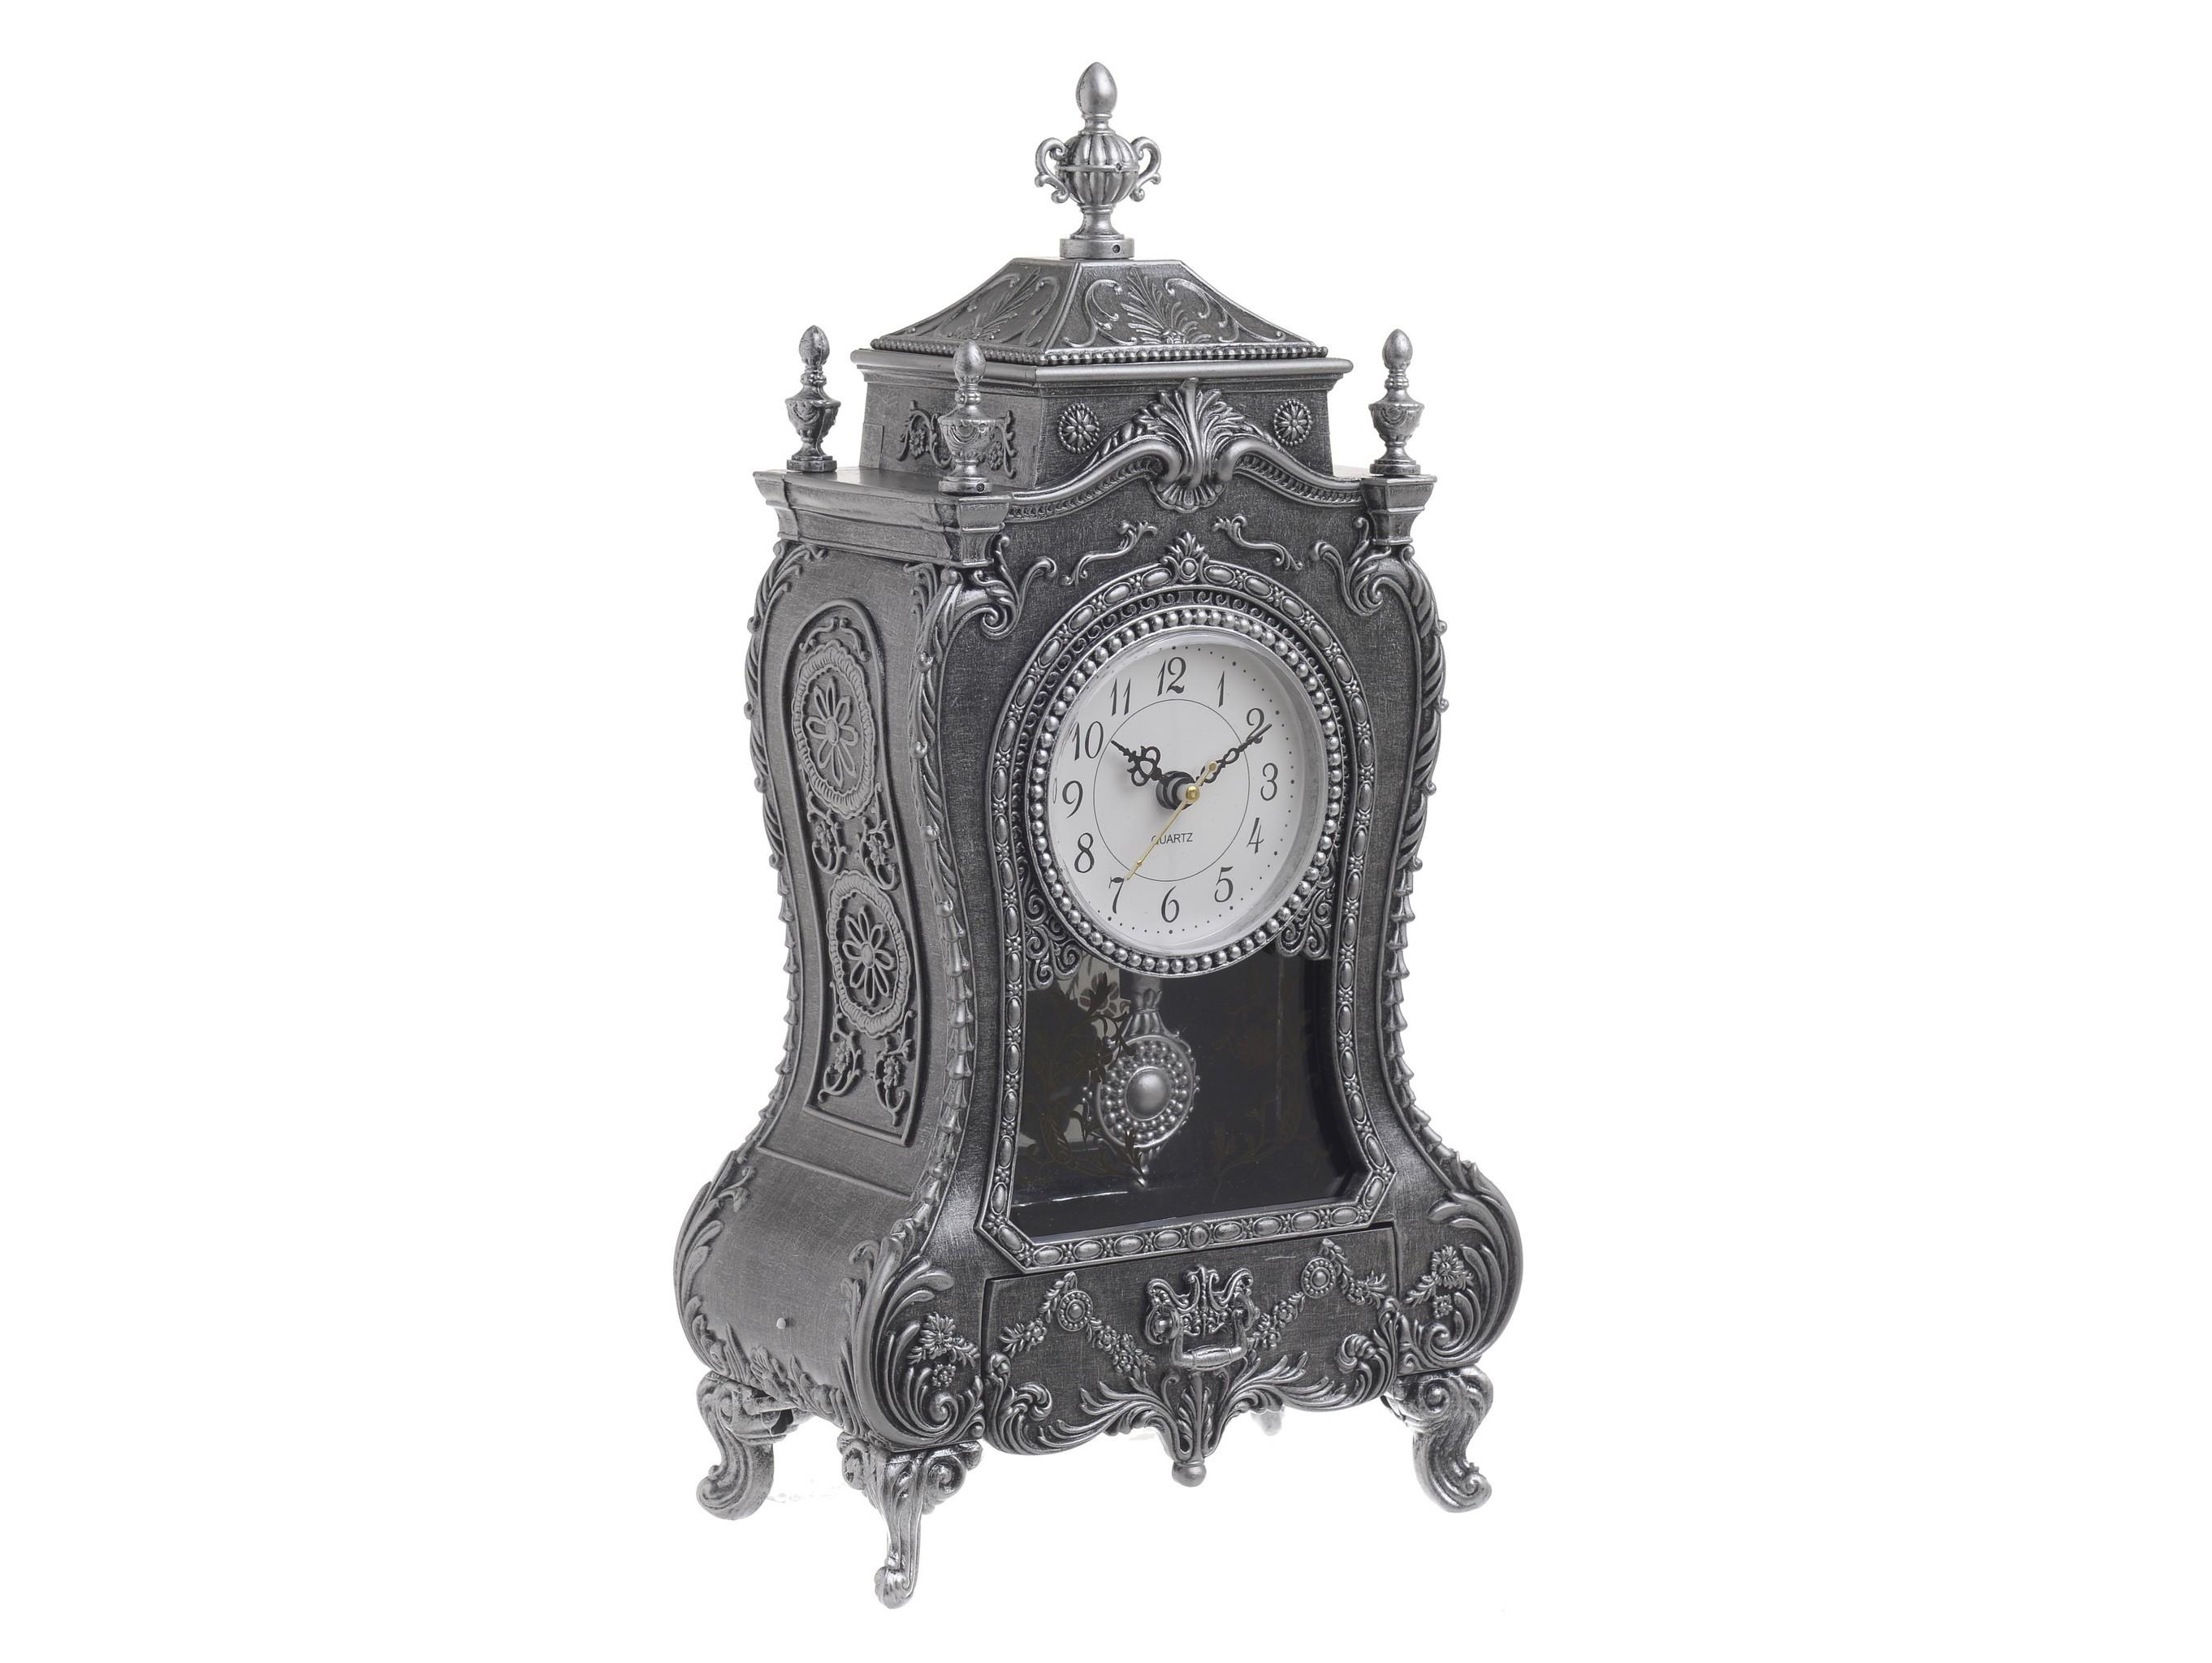 Часы музыкальные ApolineНастольные часы<br>Кварцевый механизм<br><br>Material: Полистоун<br>Ширина см: 17.0<br>Высота см: 31.5<br>Глубина см: 9.5